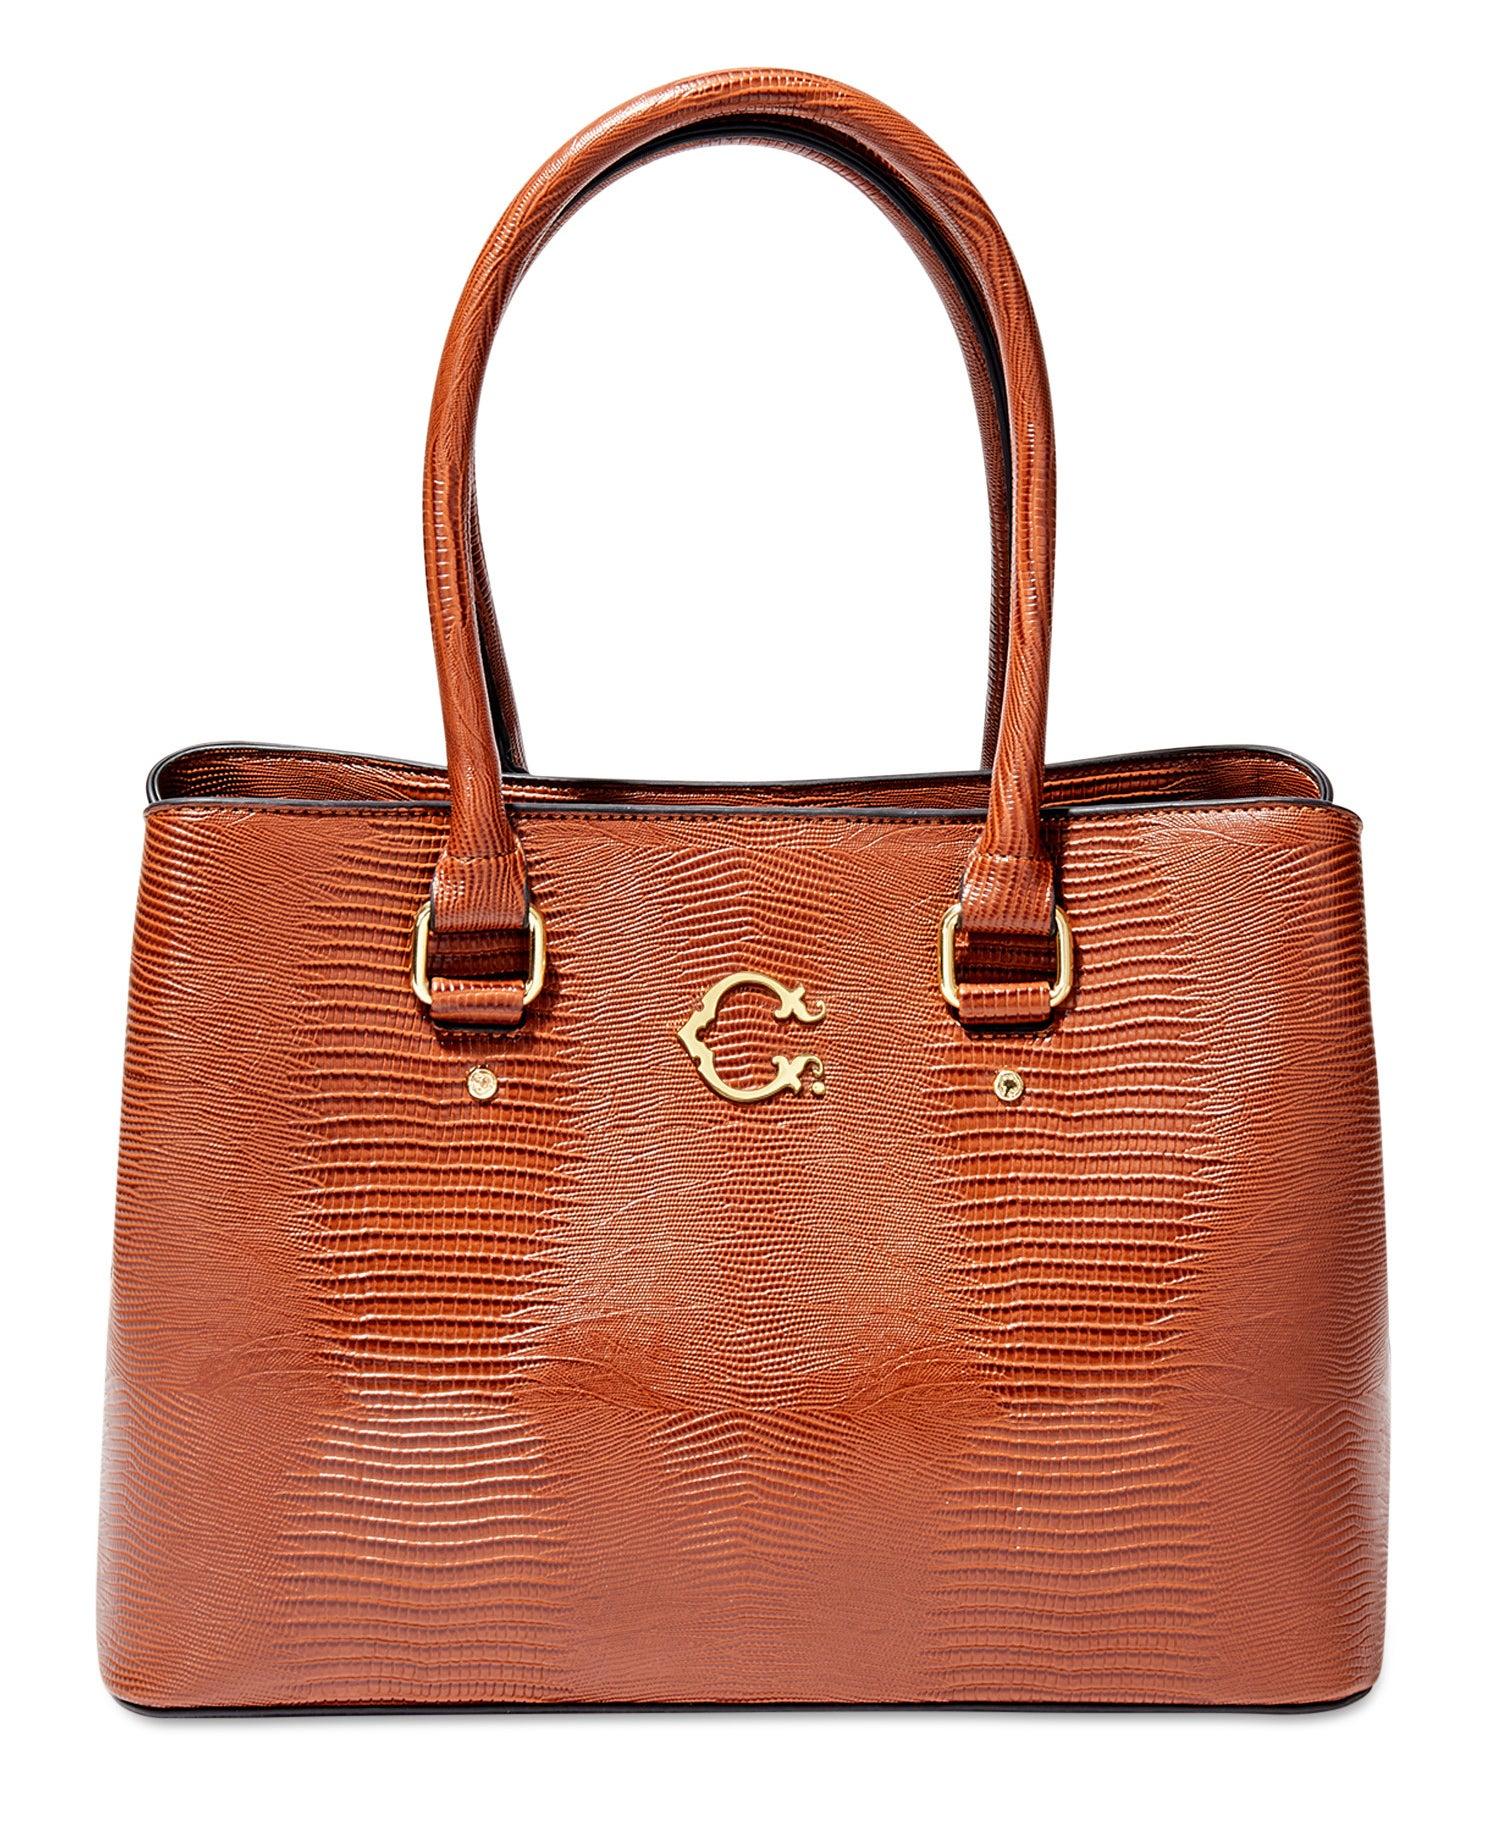 orange tote bag in a faux lizard skin pattern